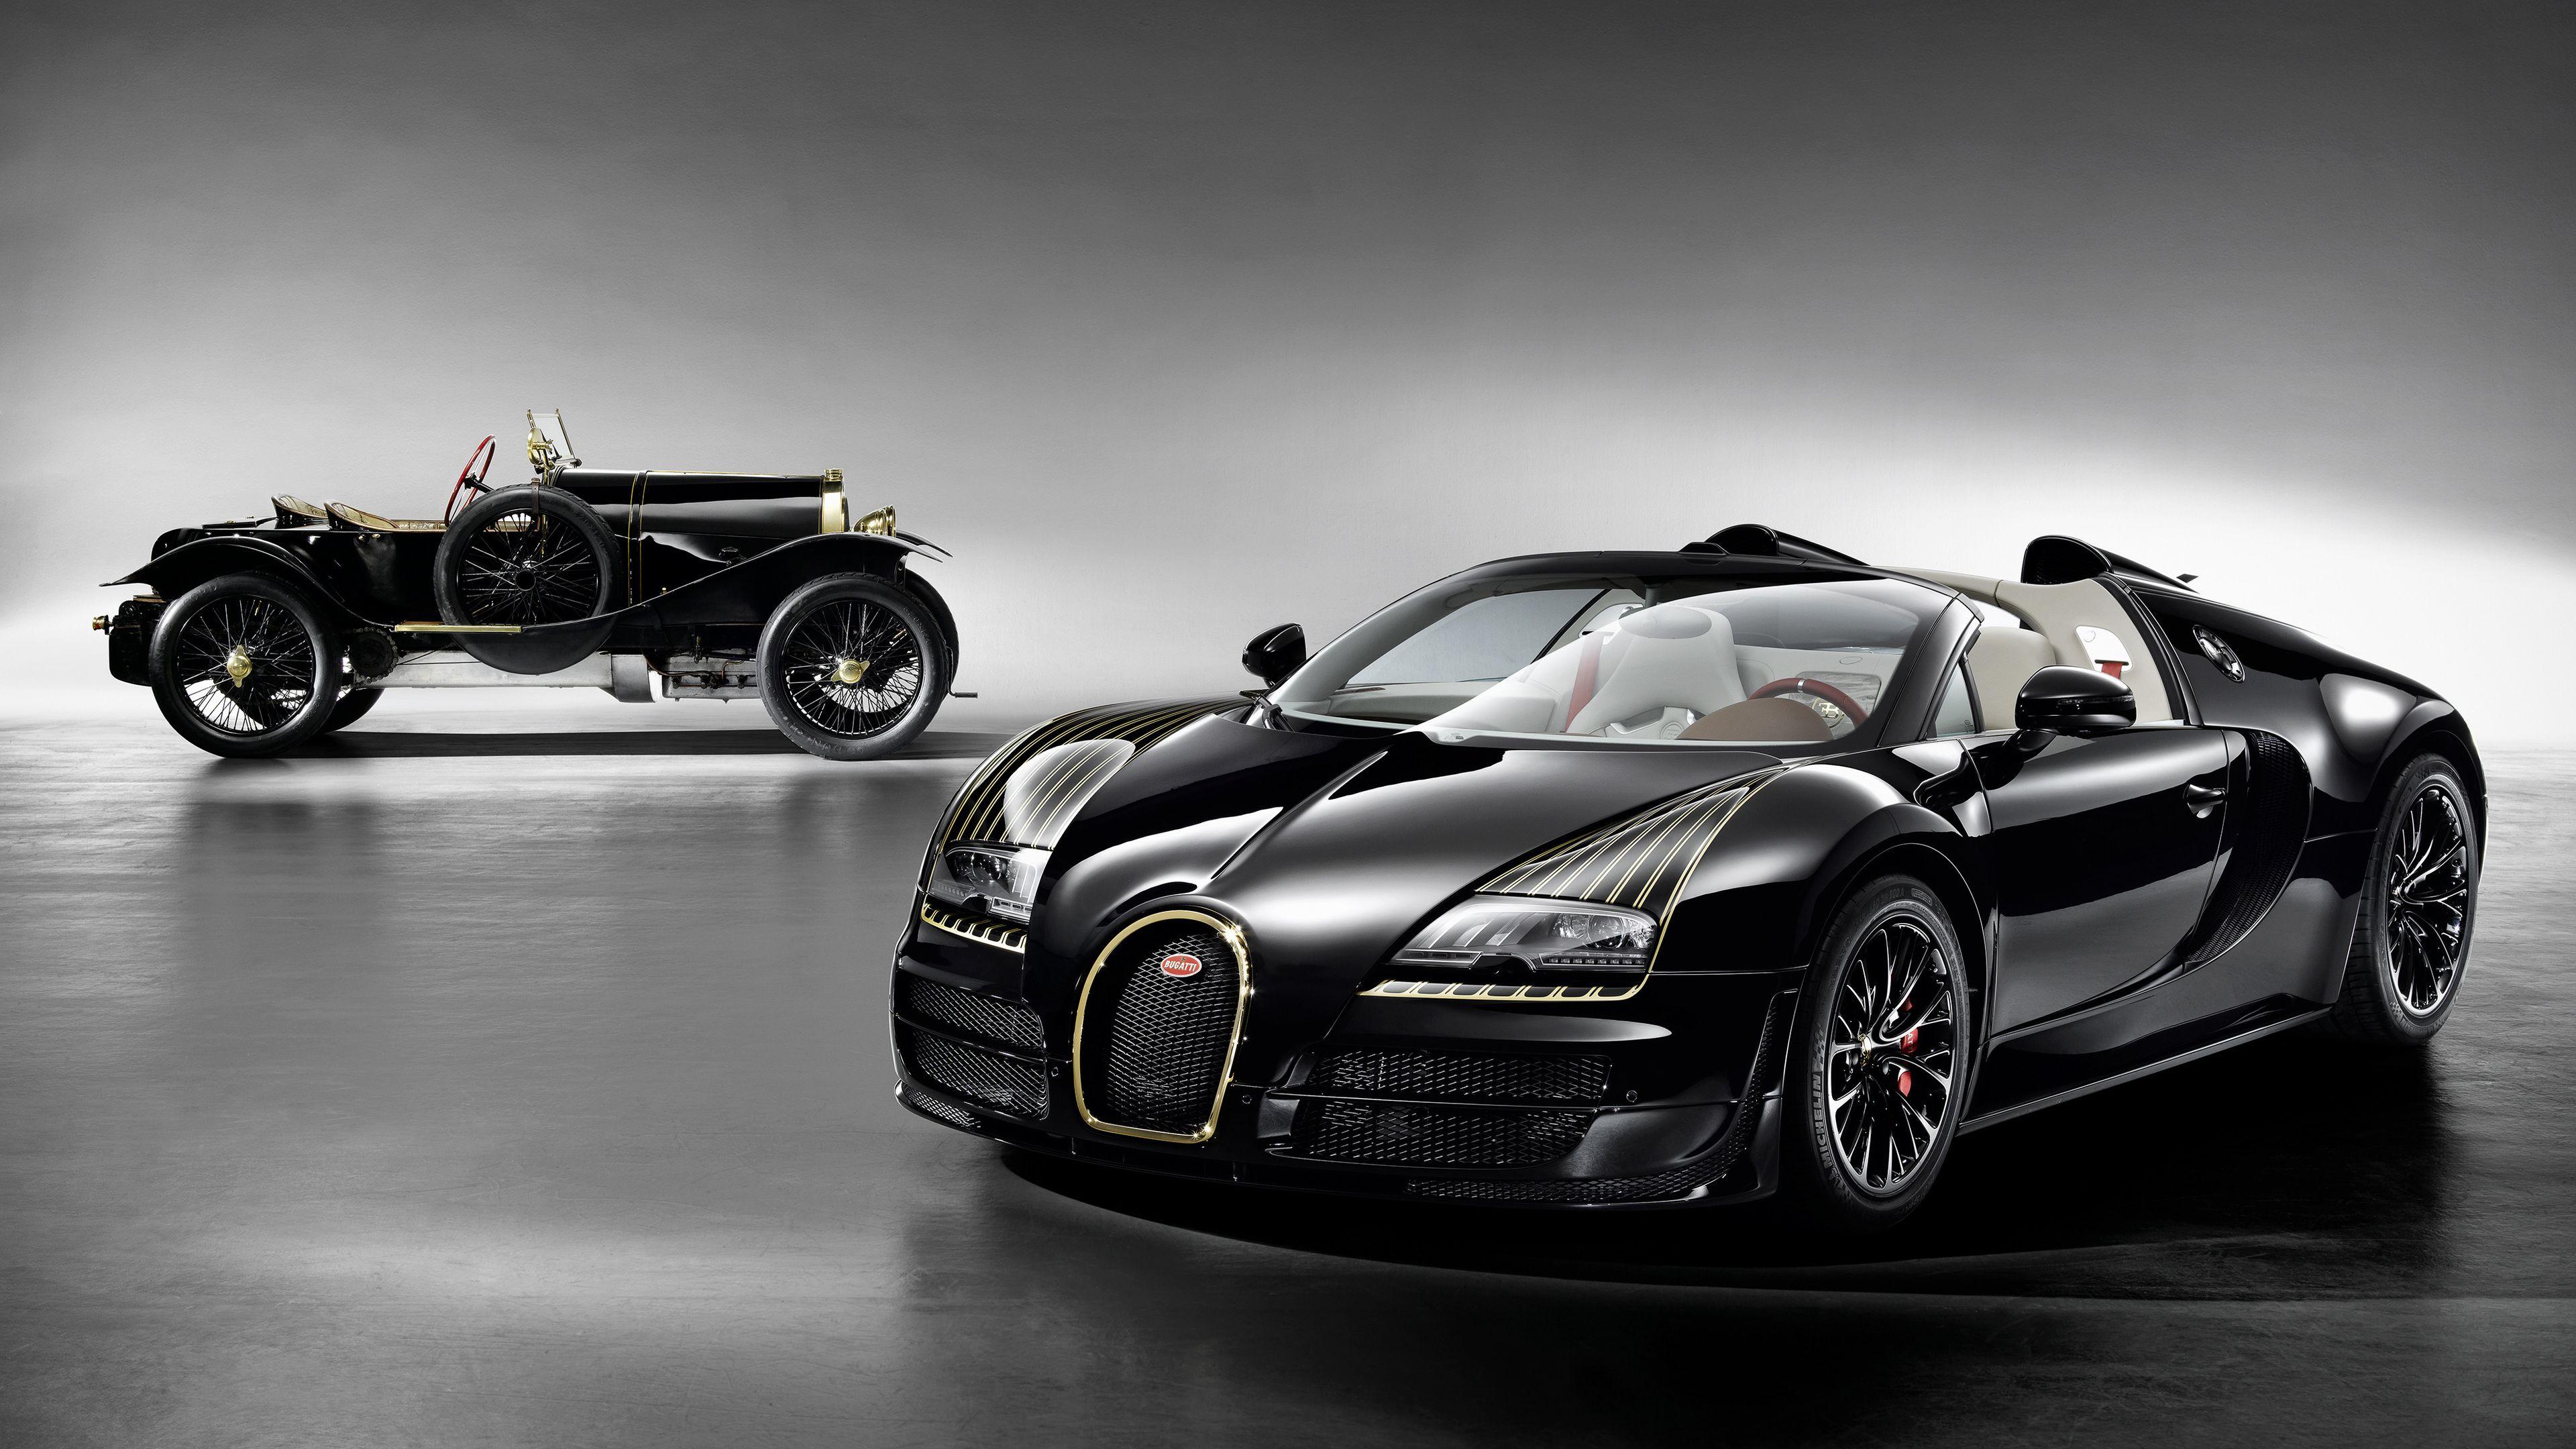 Bugatti 4k Hd Wallpapers Cars Wallpapers Bugatti Wallpapers 4k Wallpapers Bugatti Veyron Grand Sport Vitesse Bugatti Veyron Bugatti Veyron Vitesse